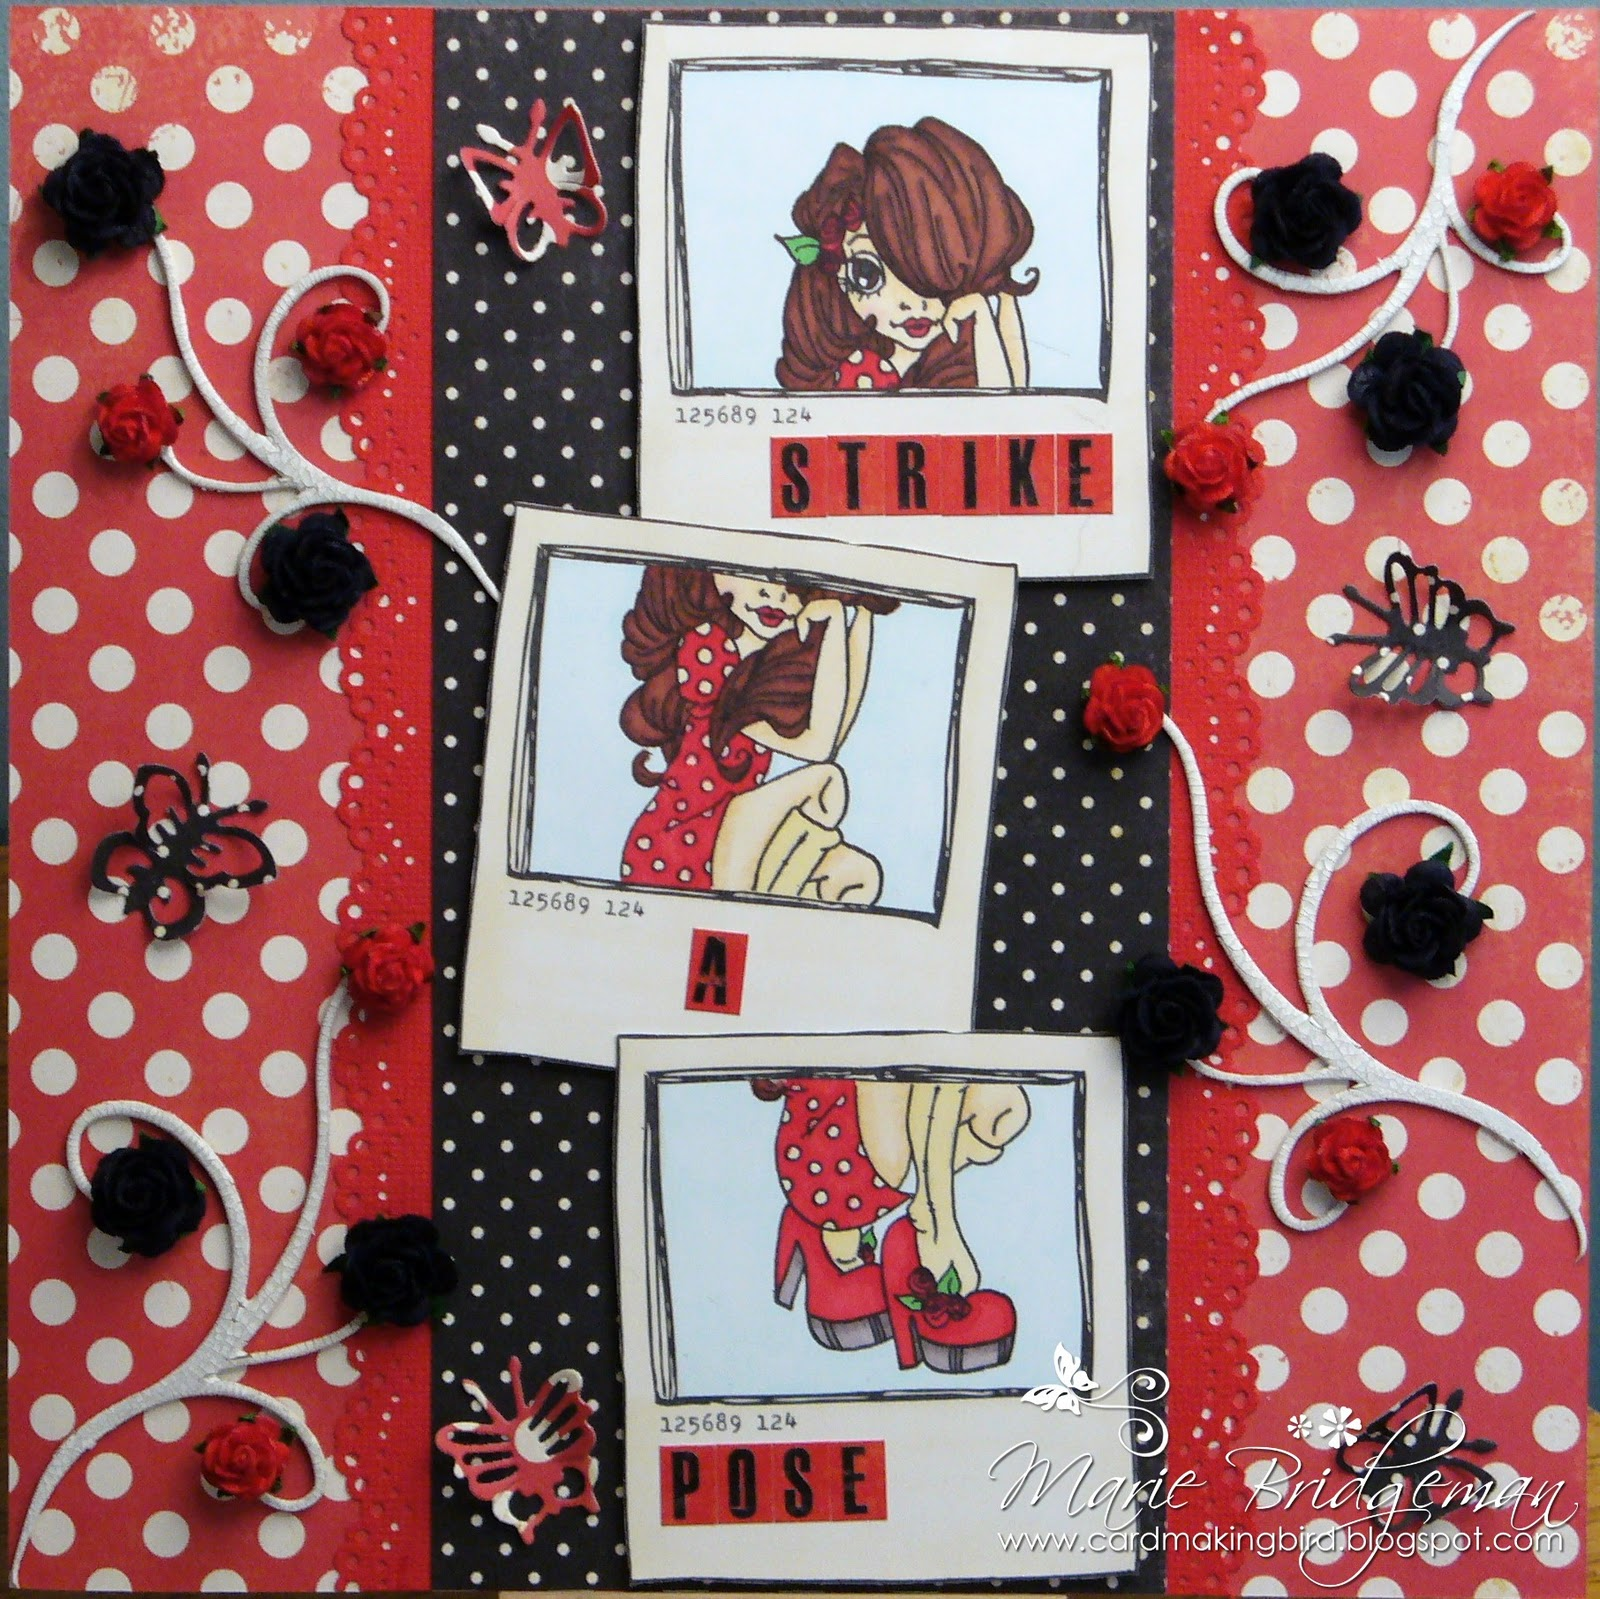 http://4.bp.blogspot.com/-bJwaEdYJ4Zg/TpVDga4huPI/AAAAAAAAEaU/lSoyU5cX1Lk/s1600/MMCS+Song+Challenge+%2526+LOTV+Card.+11+Oct+2011+004.JPG